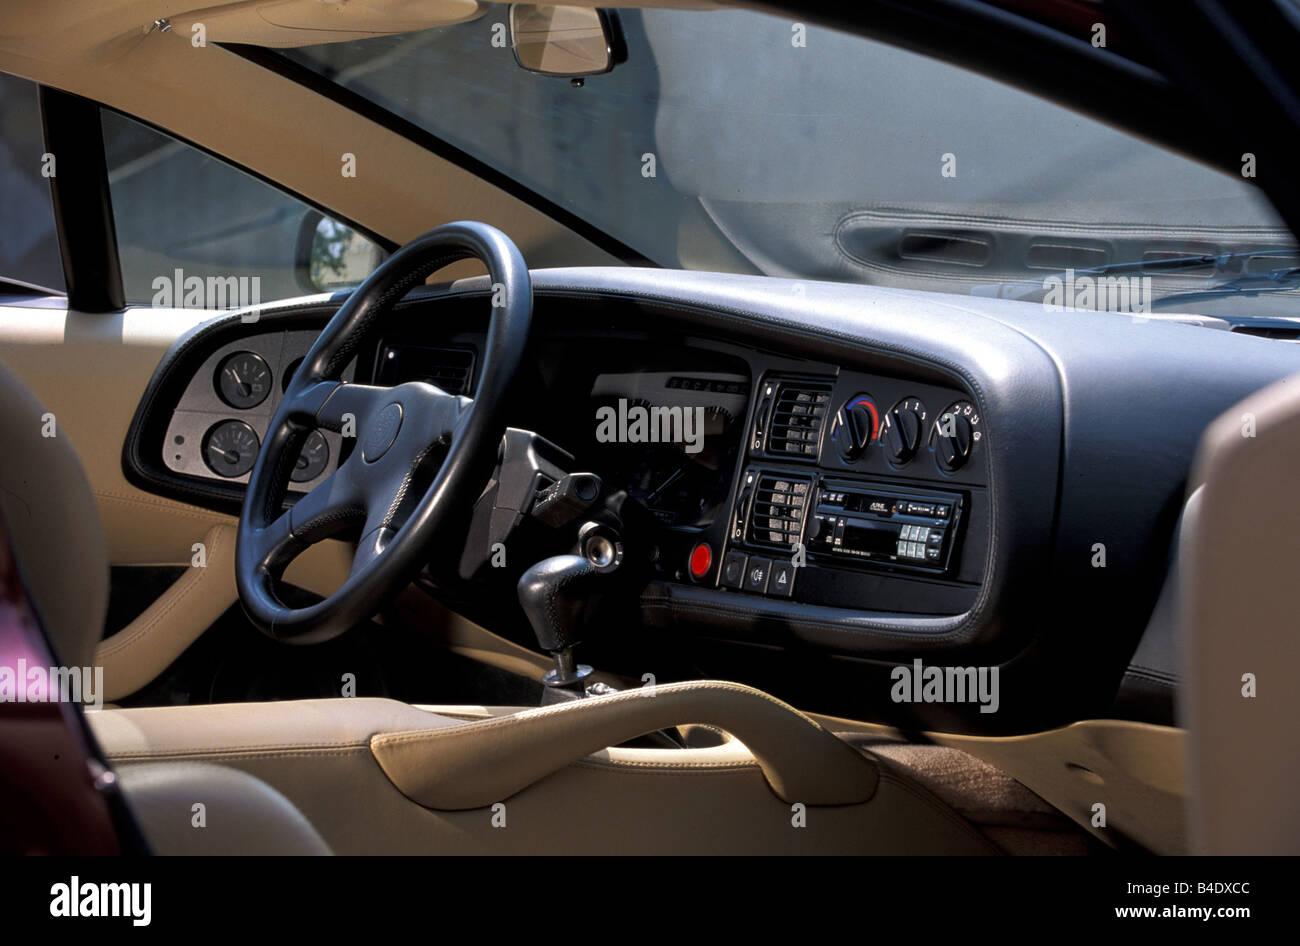 Car Jaguar Xj 220 Model Year 1994 Wine Red Metallic Coupe Coupe Stock Photo Alamy